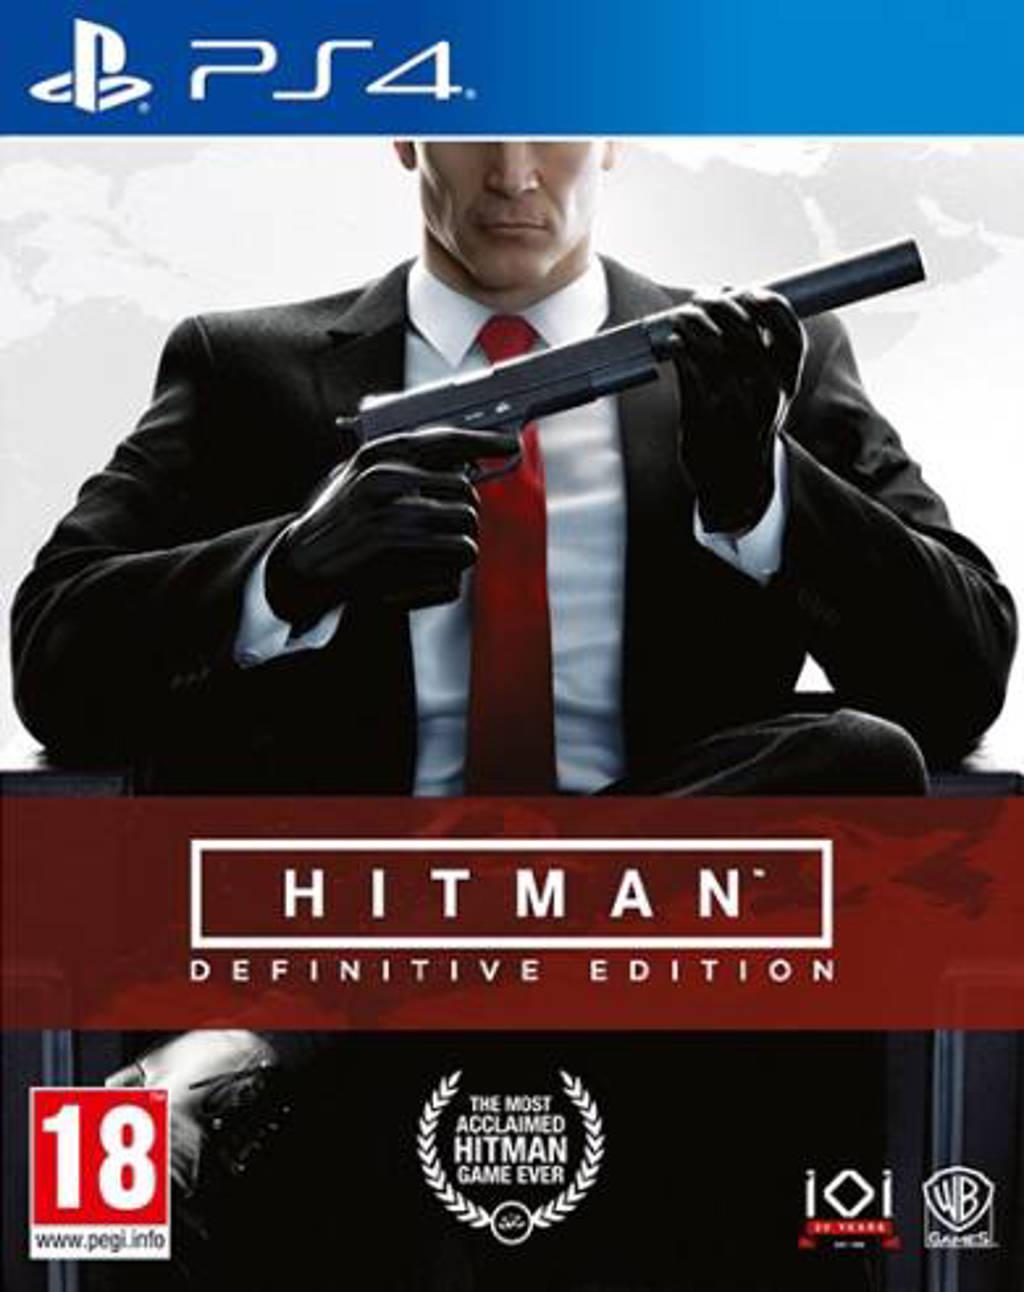 Hitman - Defenitive edition (PlayStation 4)